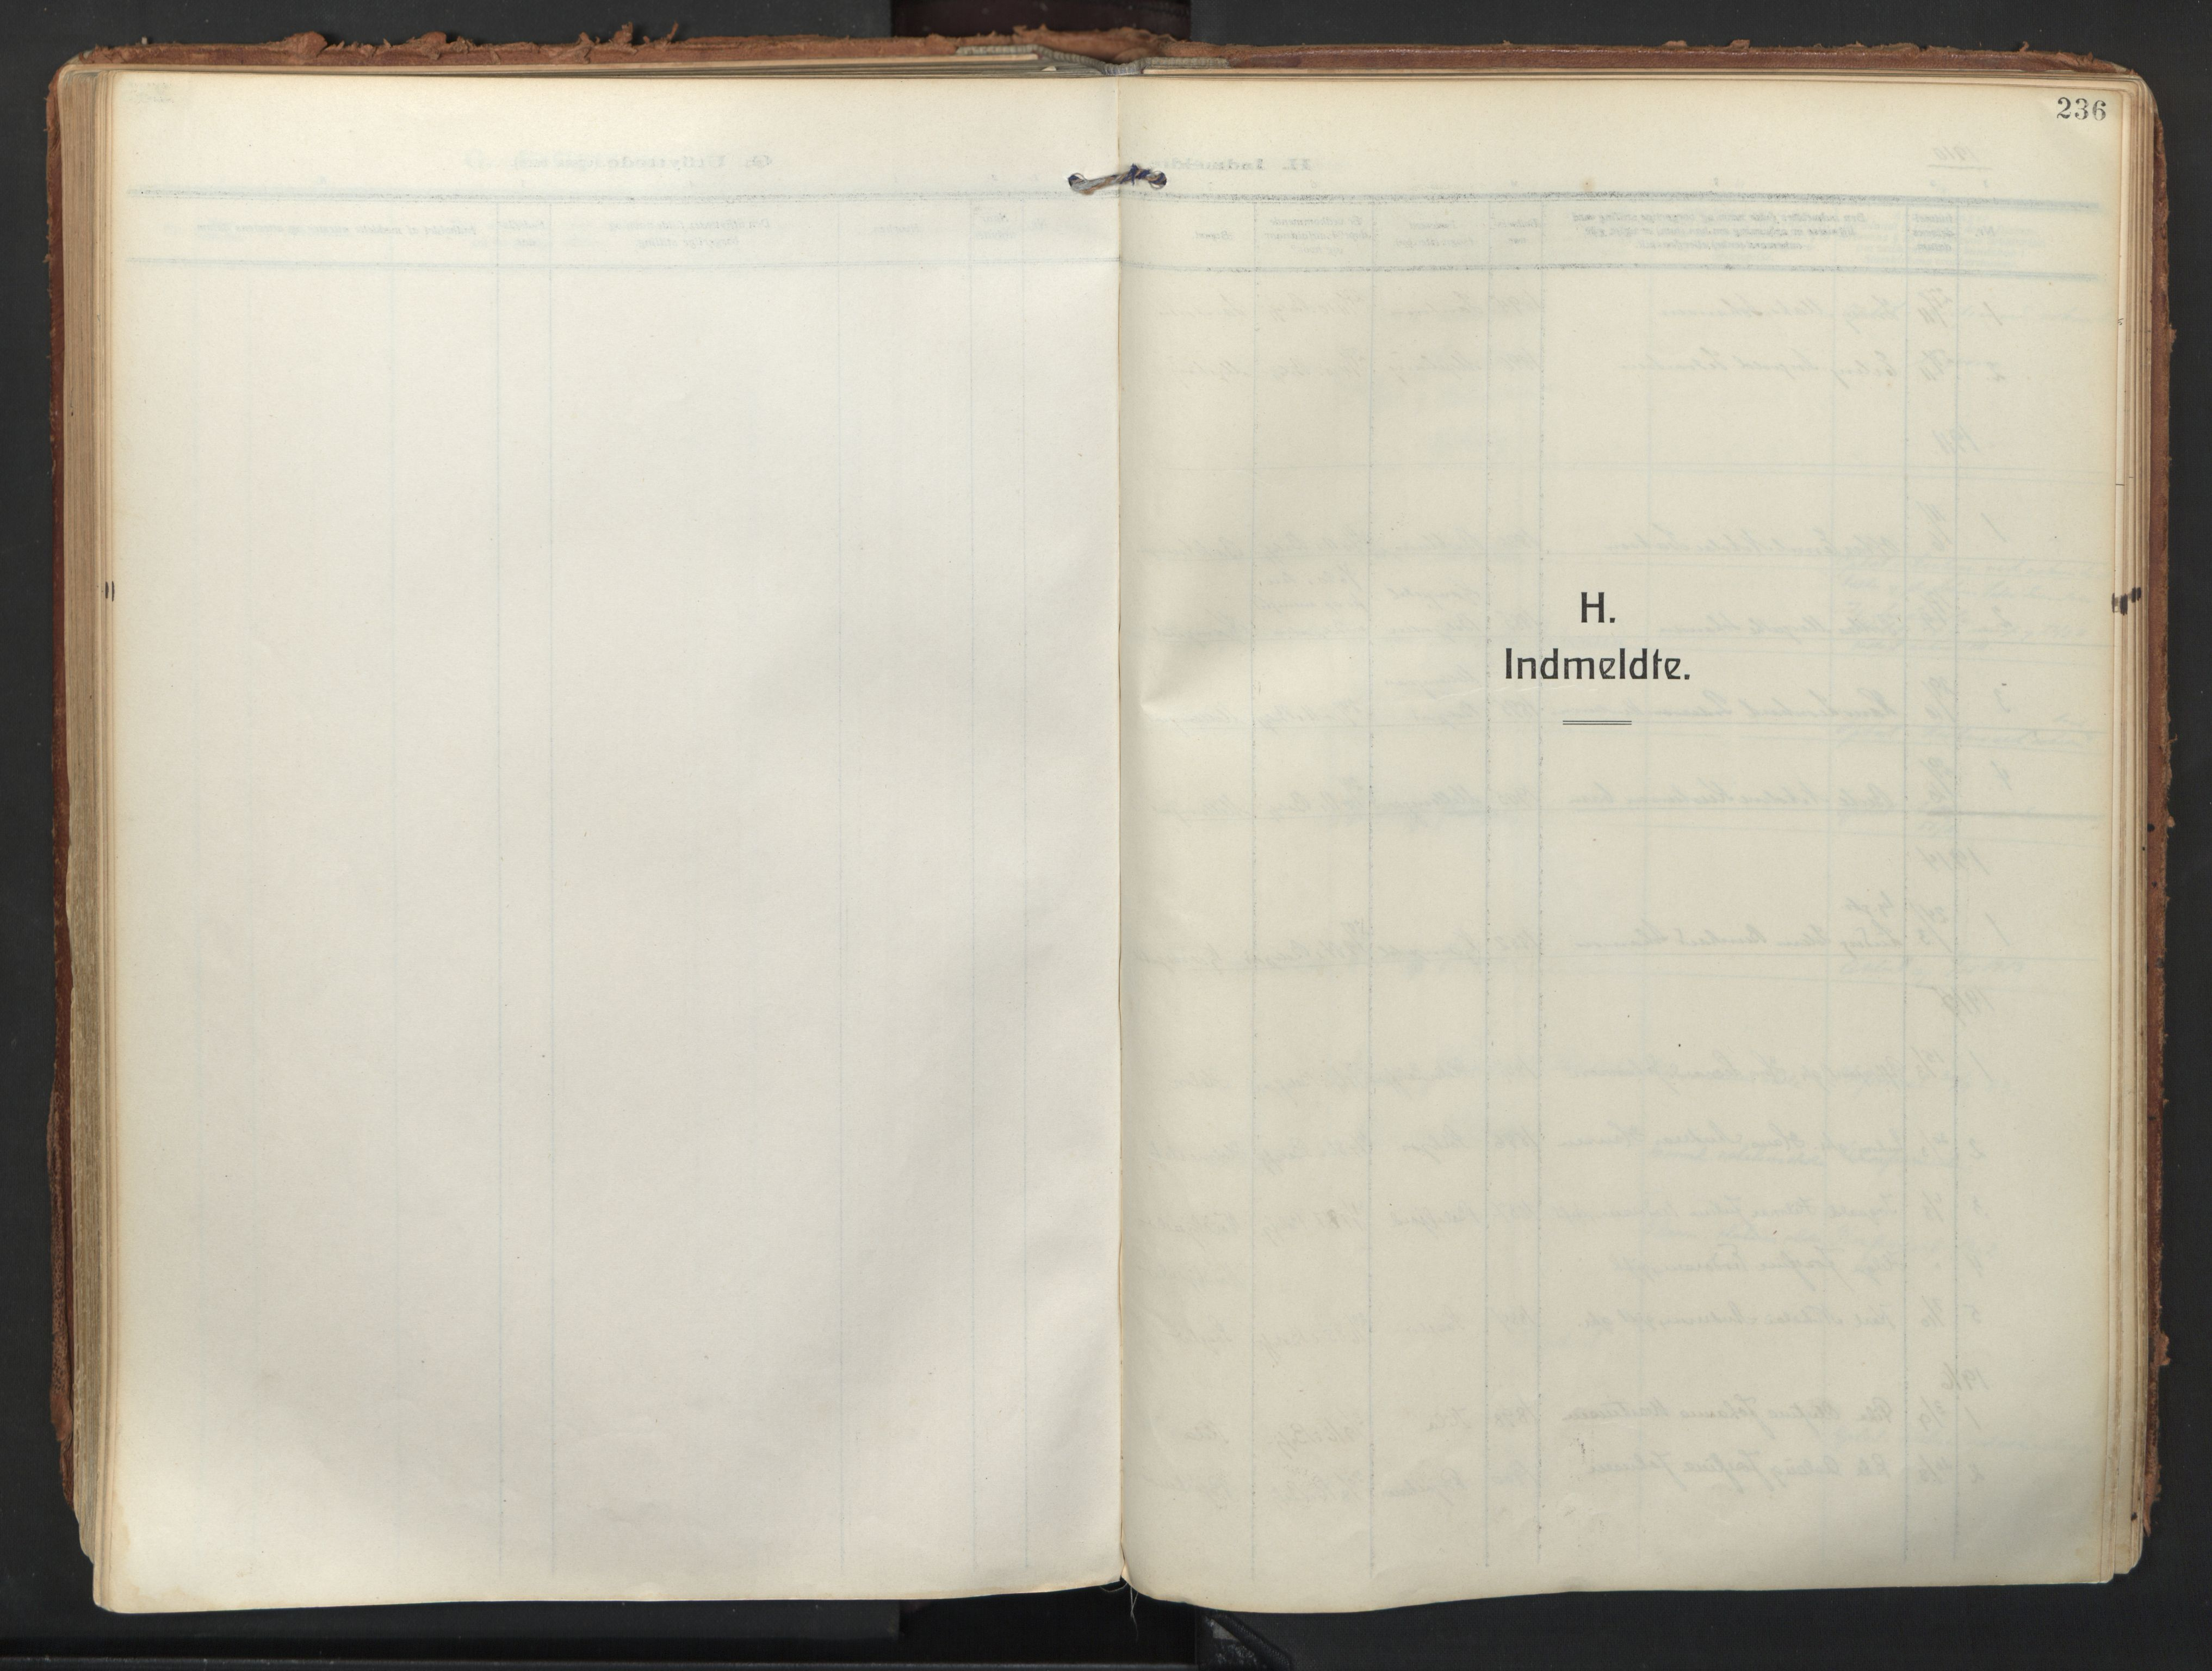 SATØ, Balsfjord sokneprestembete, Parish register (official) no. 9, 1909-1921, p. 236